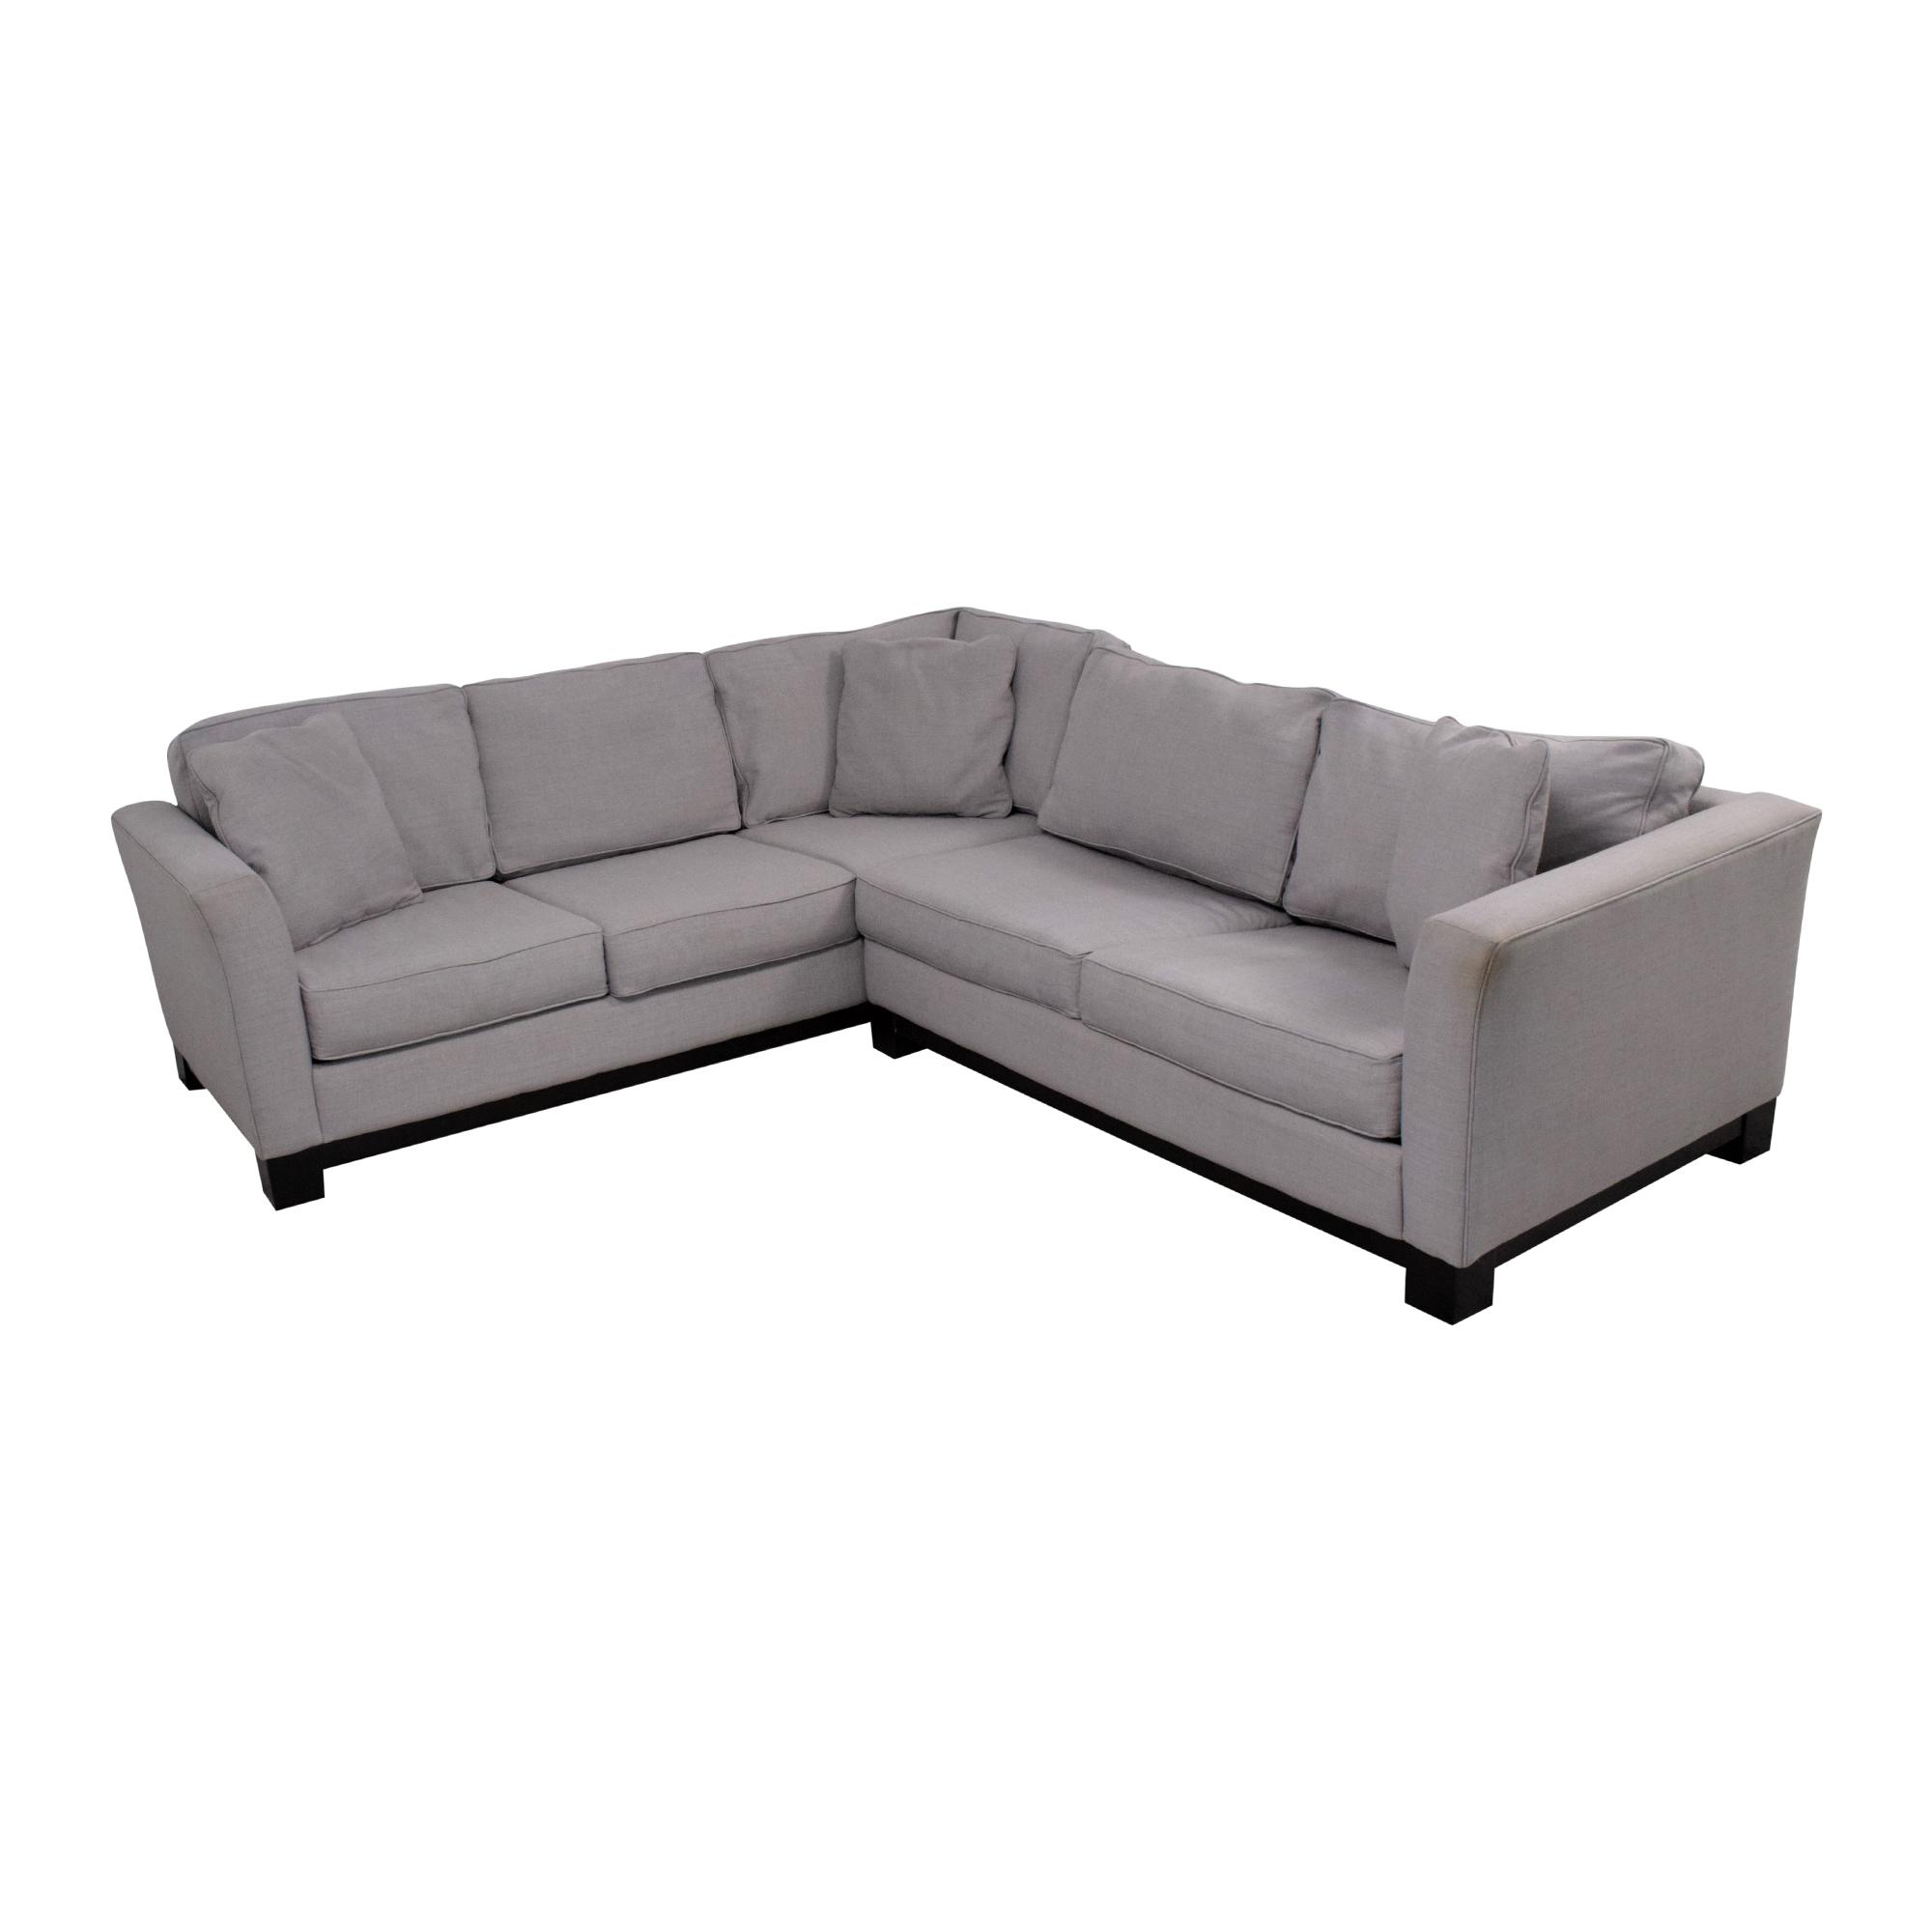 shop Macy's Macy's Elliot 2pc Sleeper Sofa Sectional online